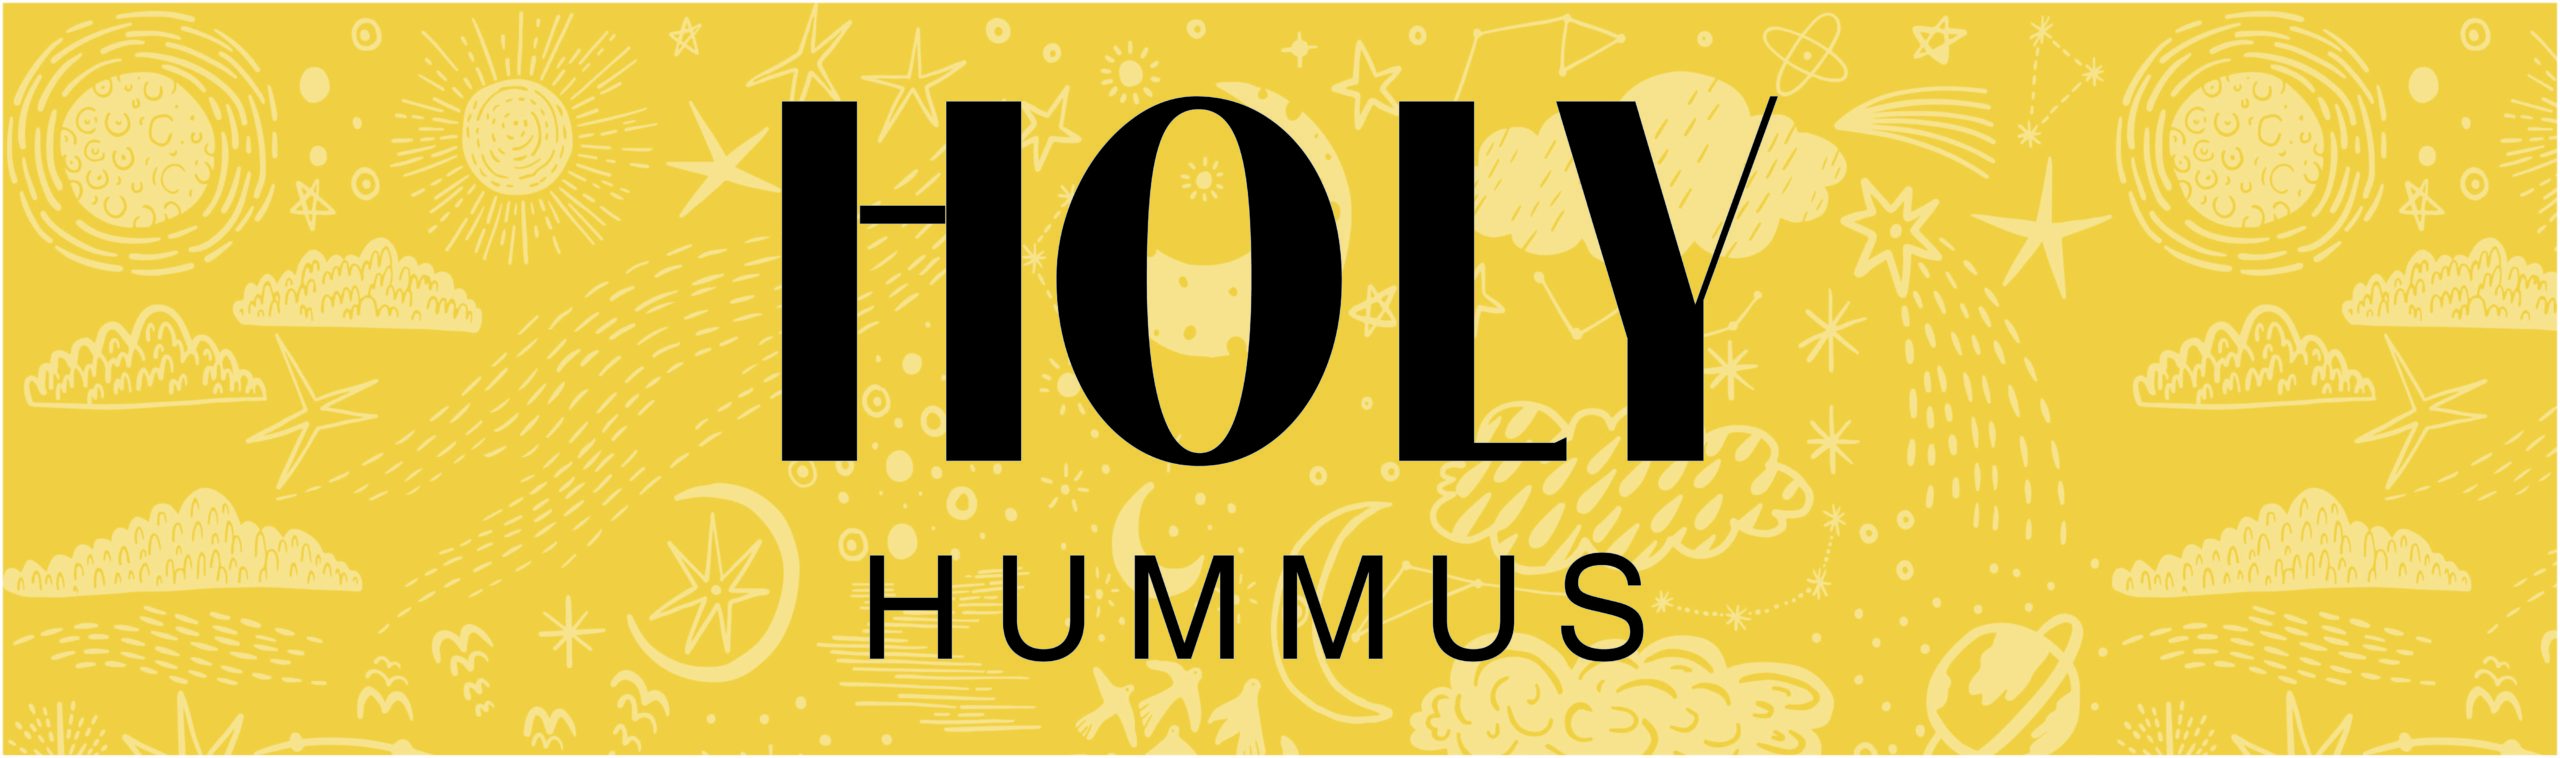 Wielkie Otwarcie Holy Hummus